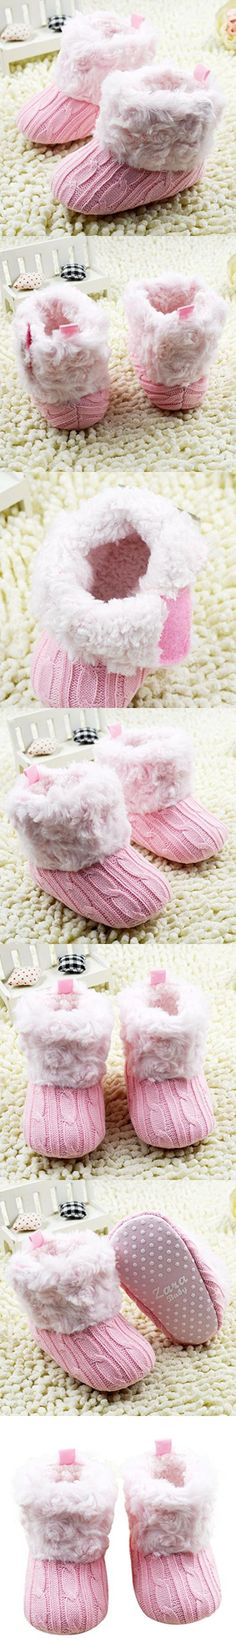 Sunward Toddler Baby Girls Knit Soft Fur Winter Warm Snow Boots Crib Shoes (11CM(Suggest 0-12 months), Pink)